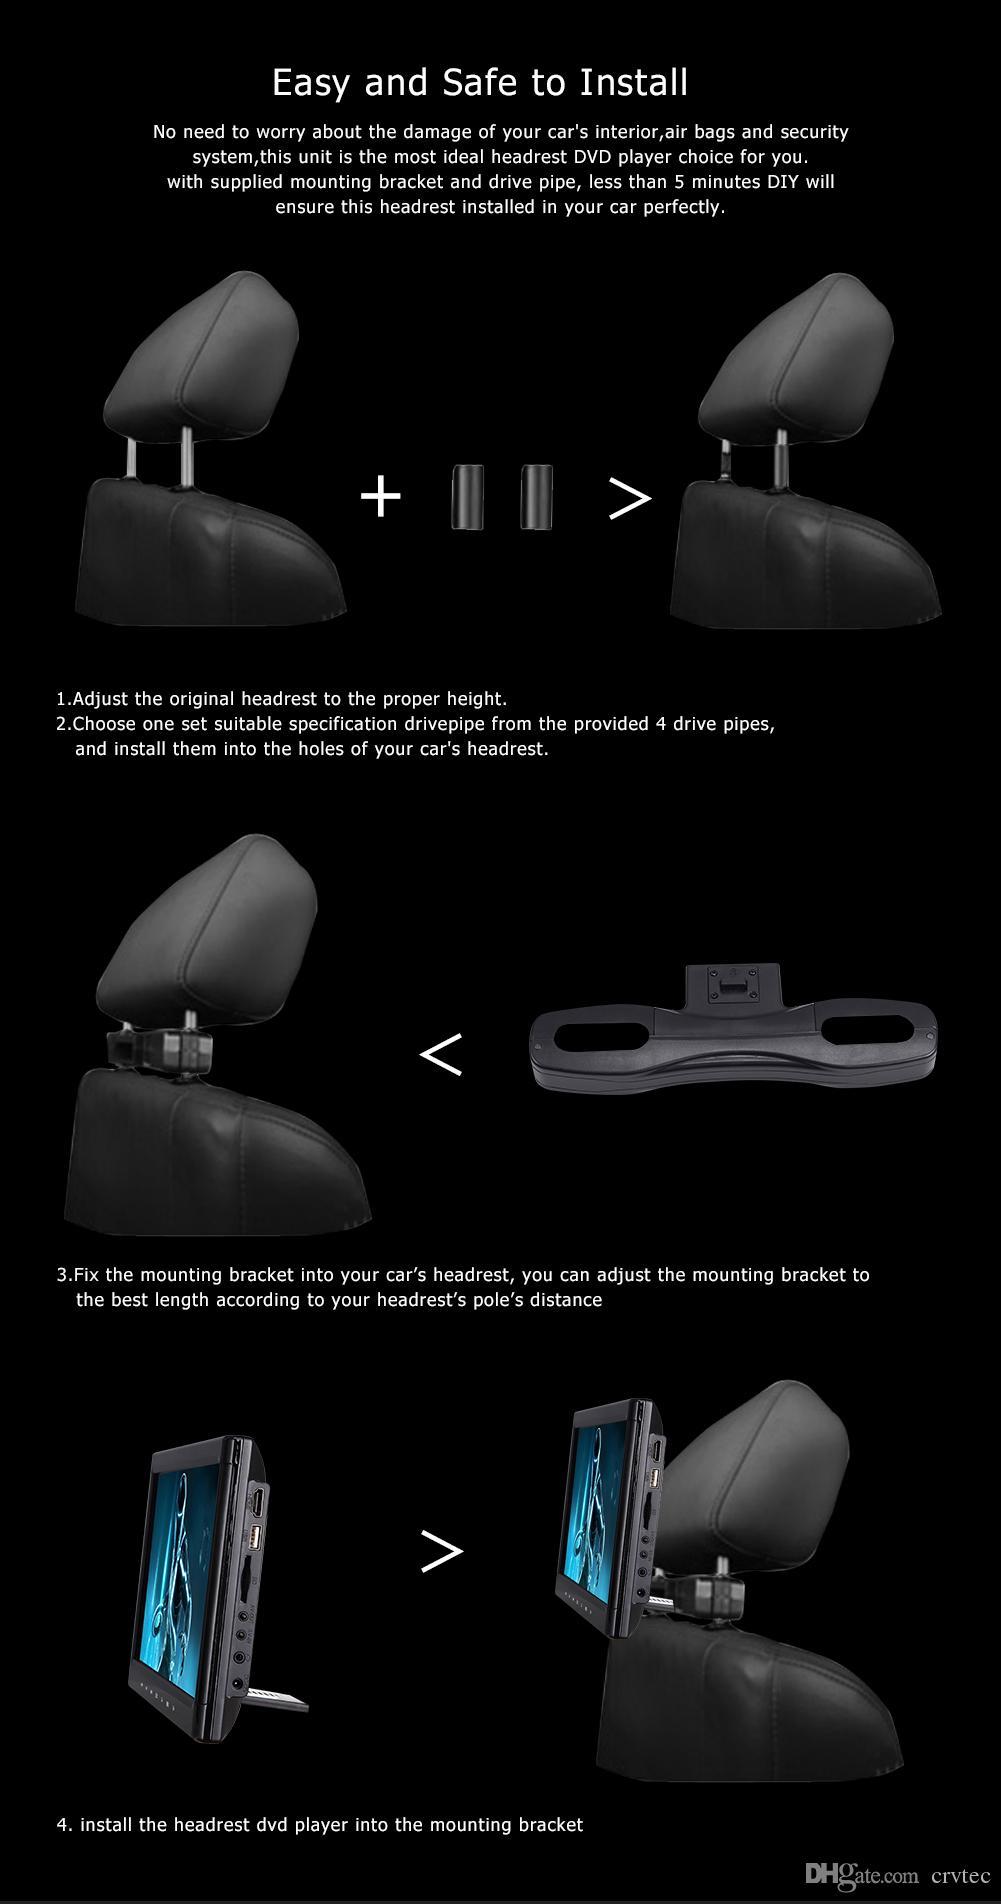 2x10.1 inch car dvd headrest portable fitting for car HD player Hdmi USB SD FM IR game car headrest holder black